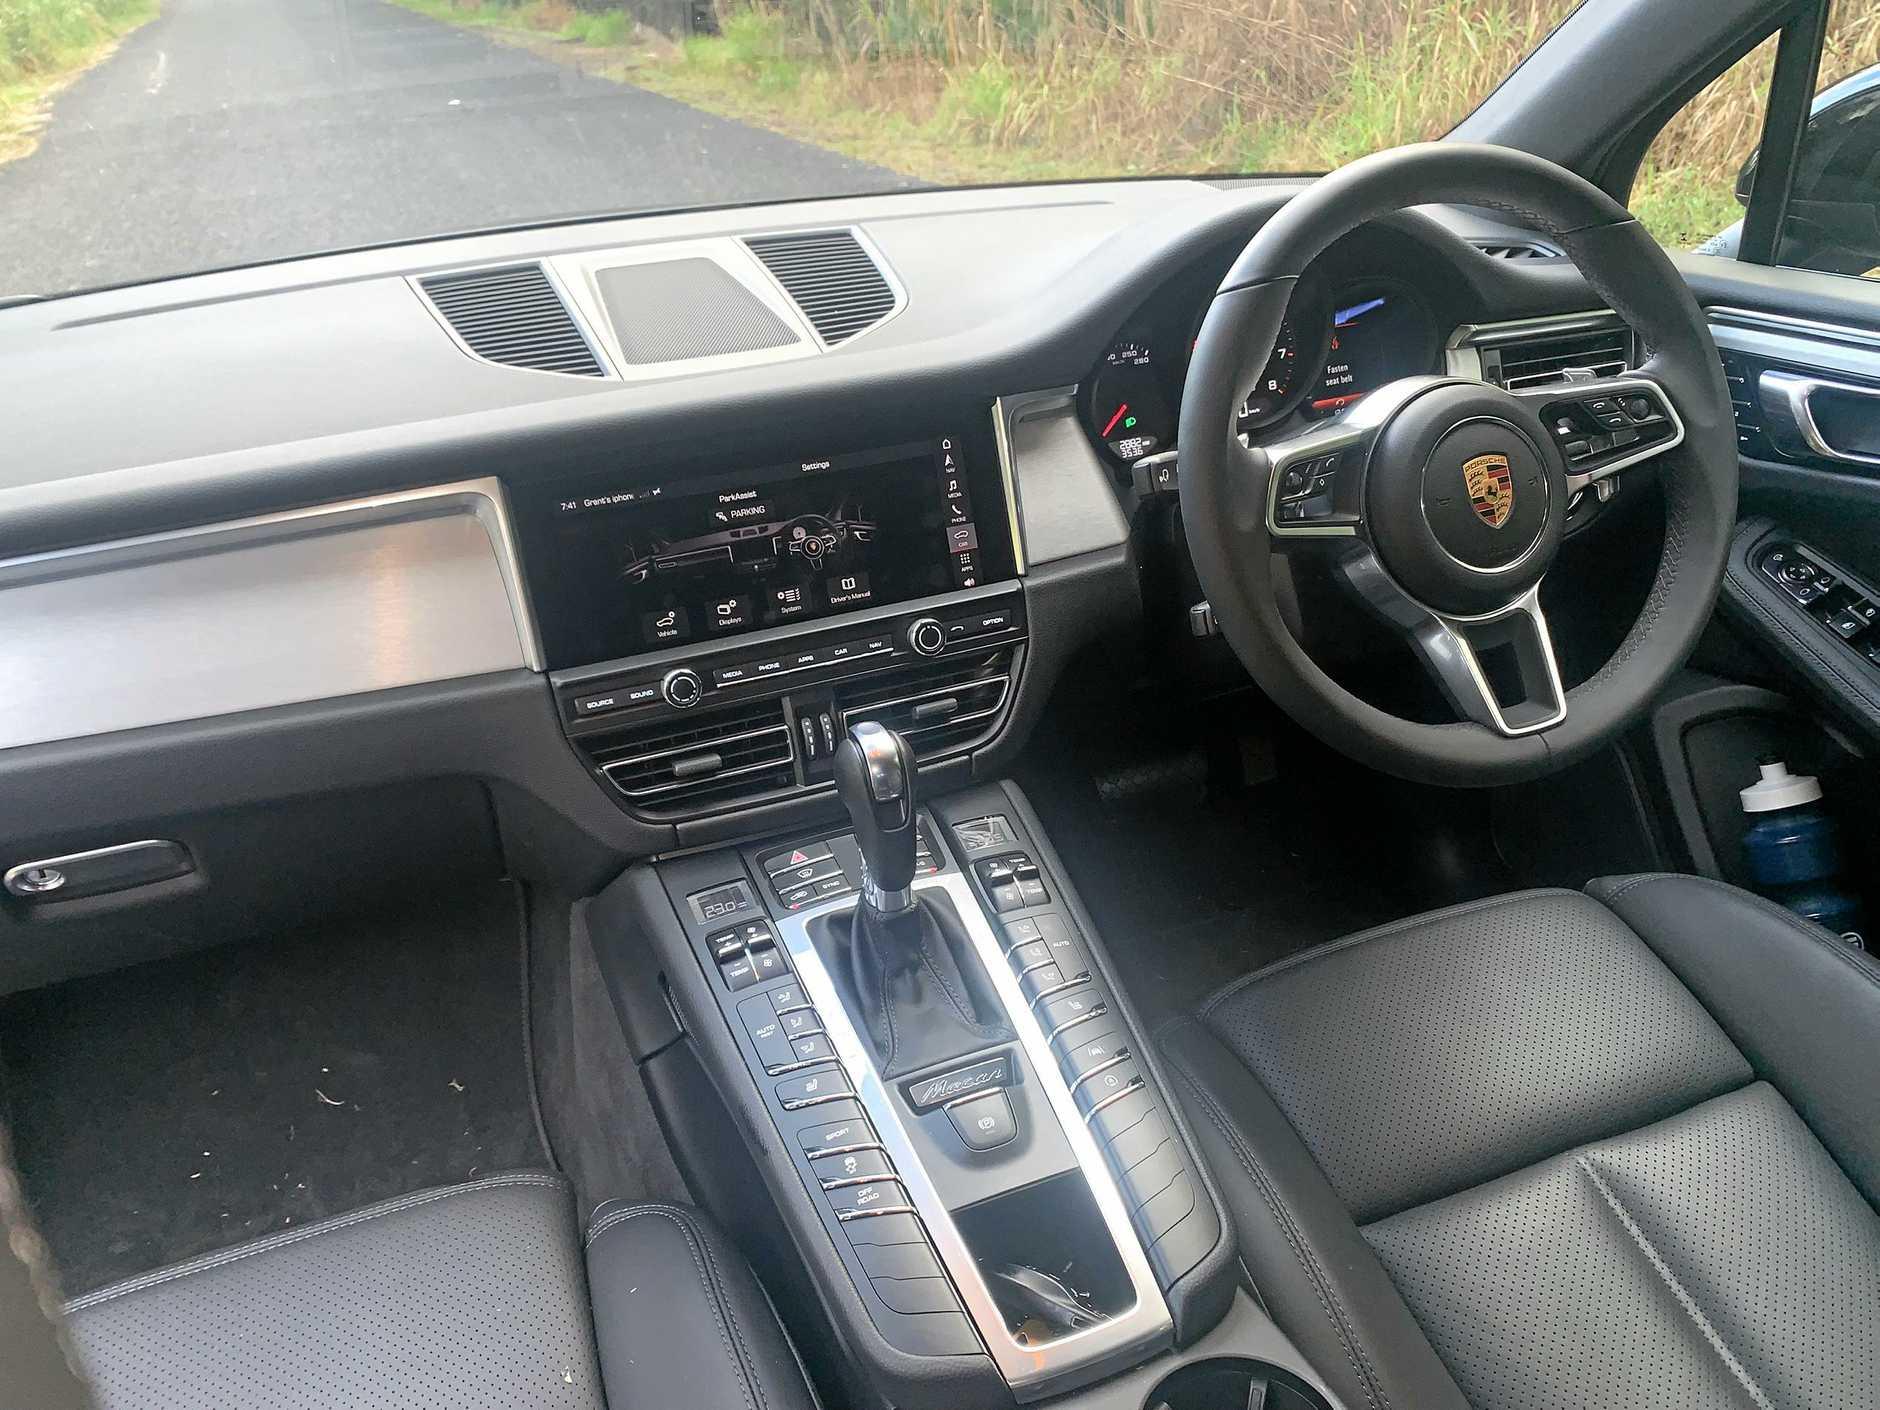 The 2019 Model Porsche Macan.